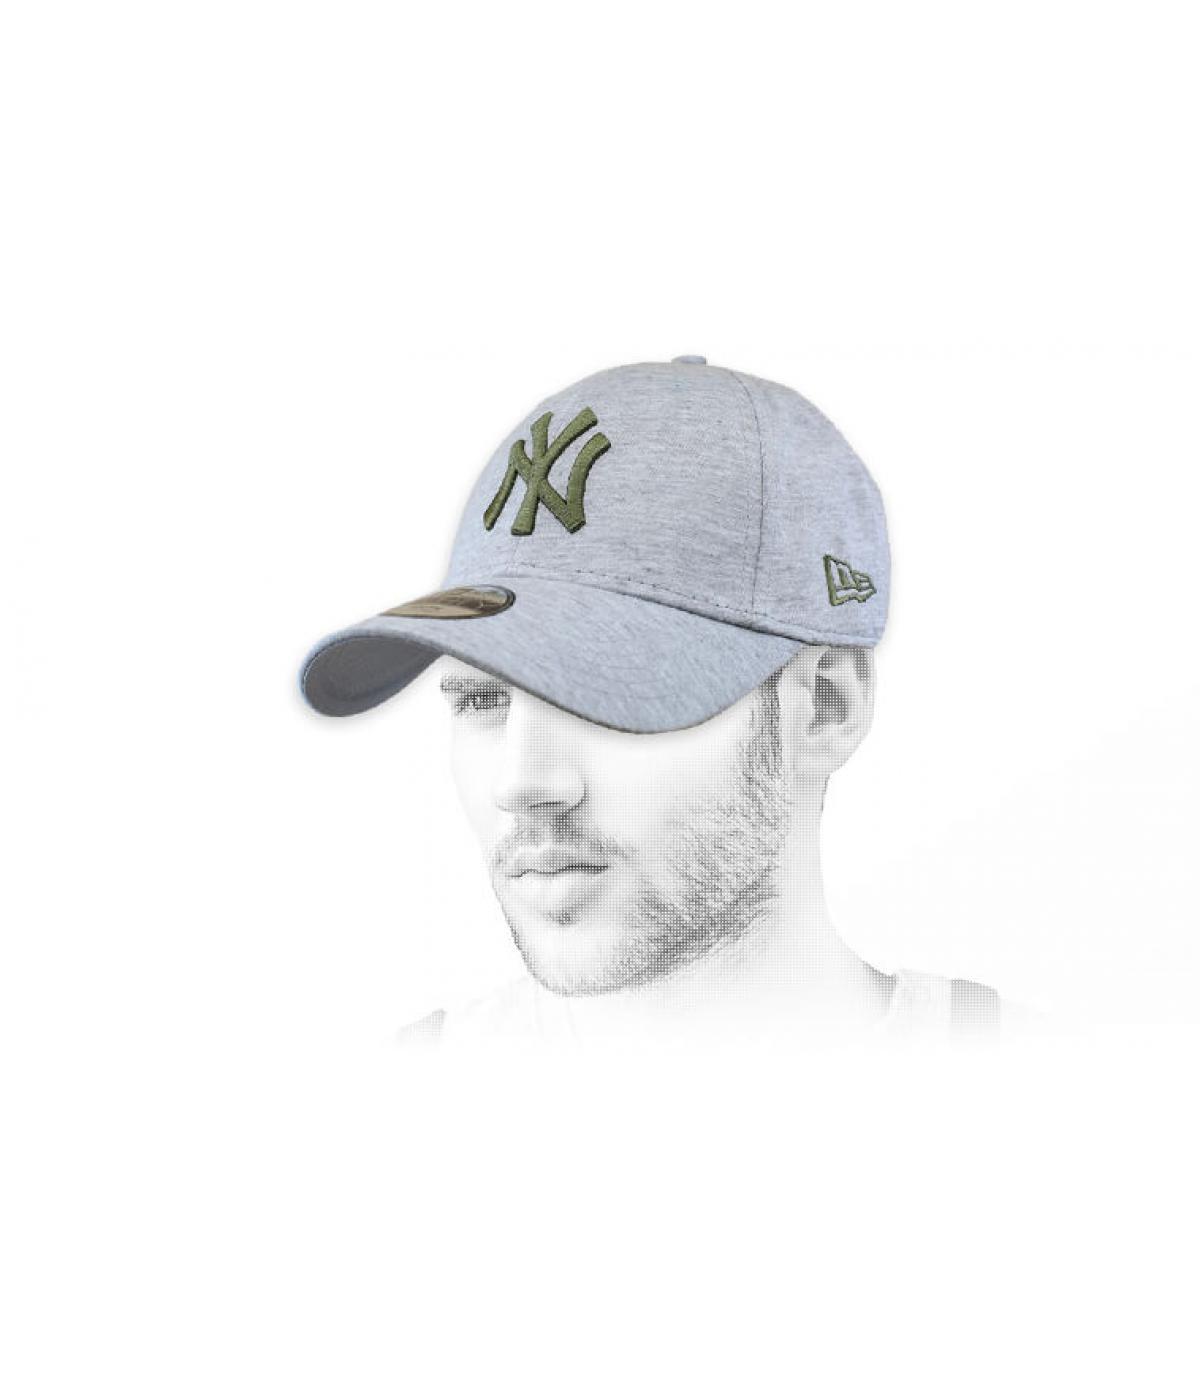 casquette NY gris vert